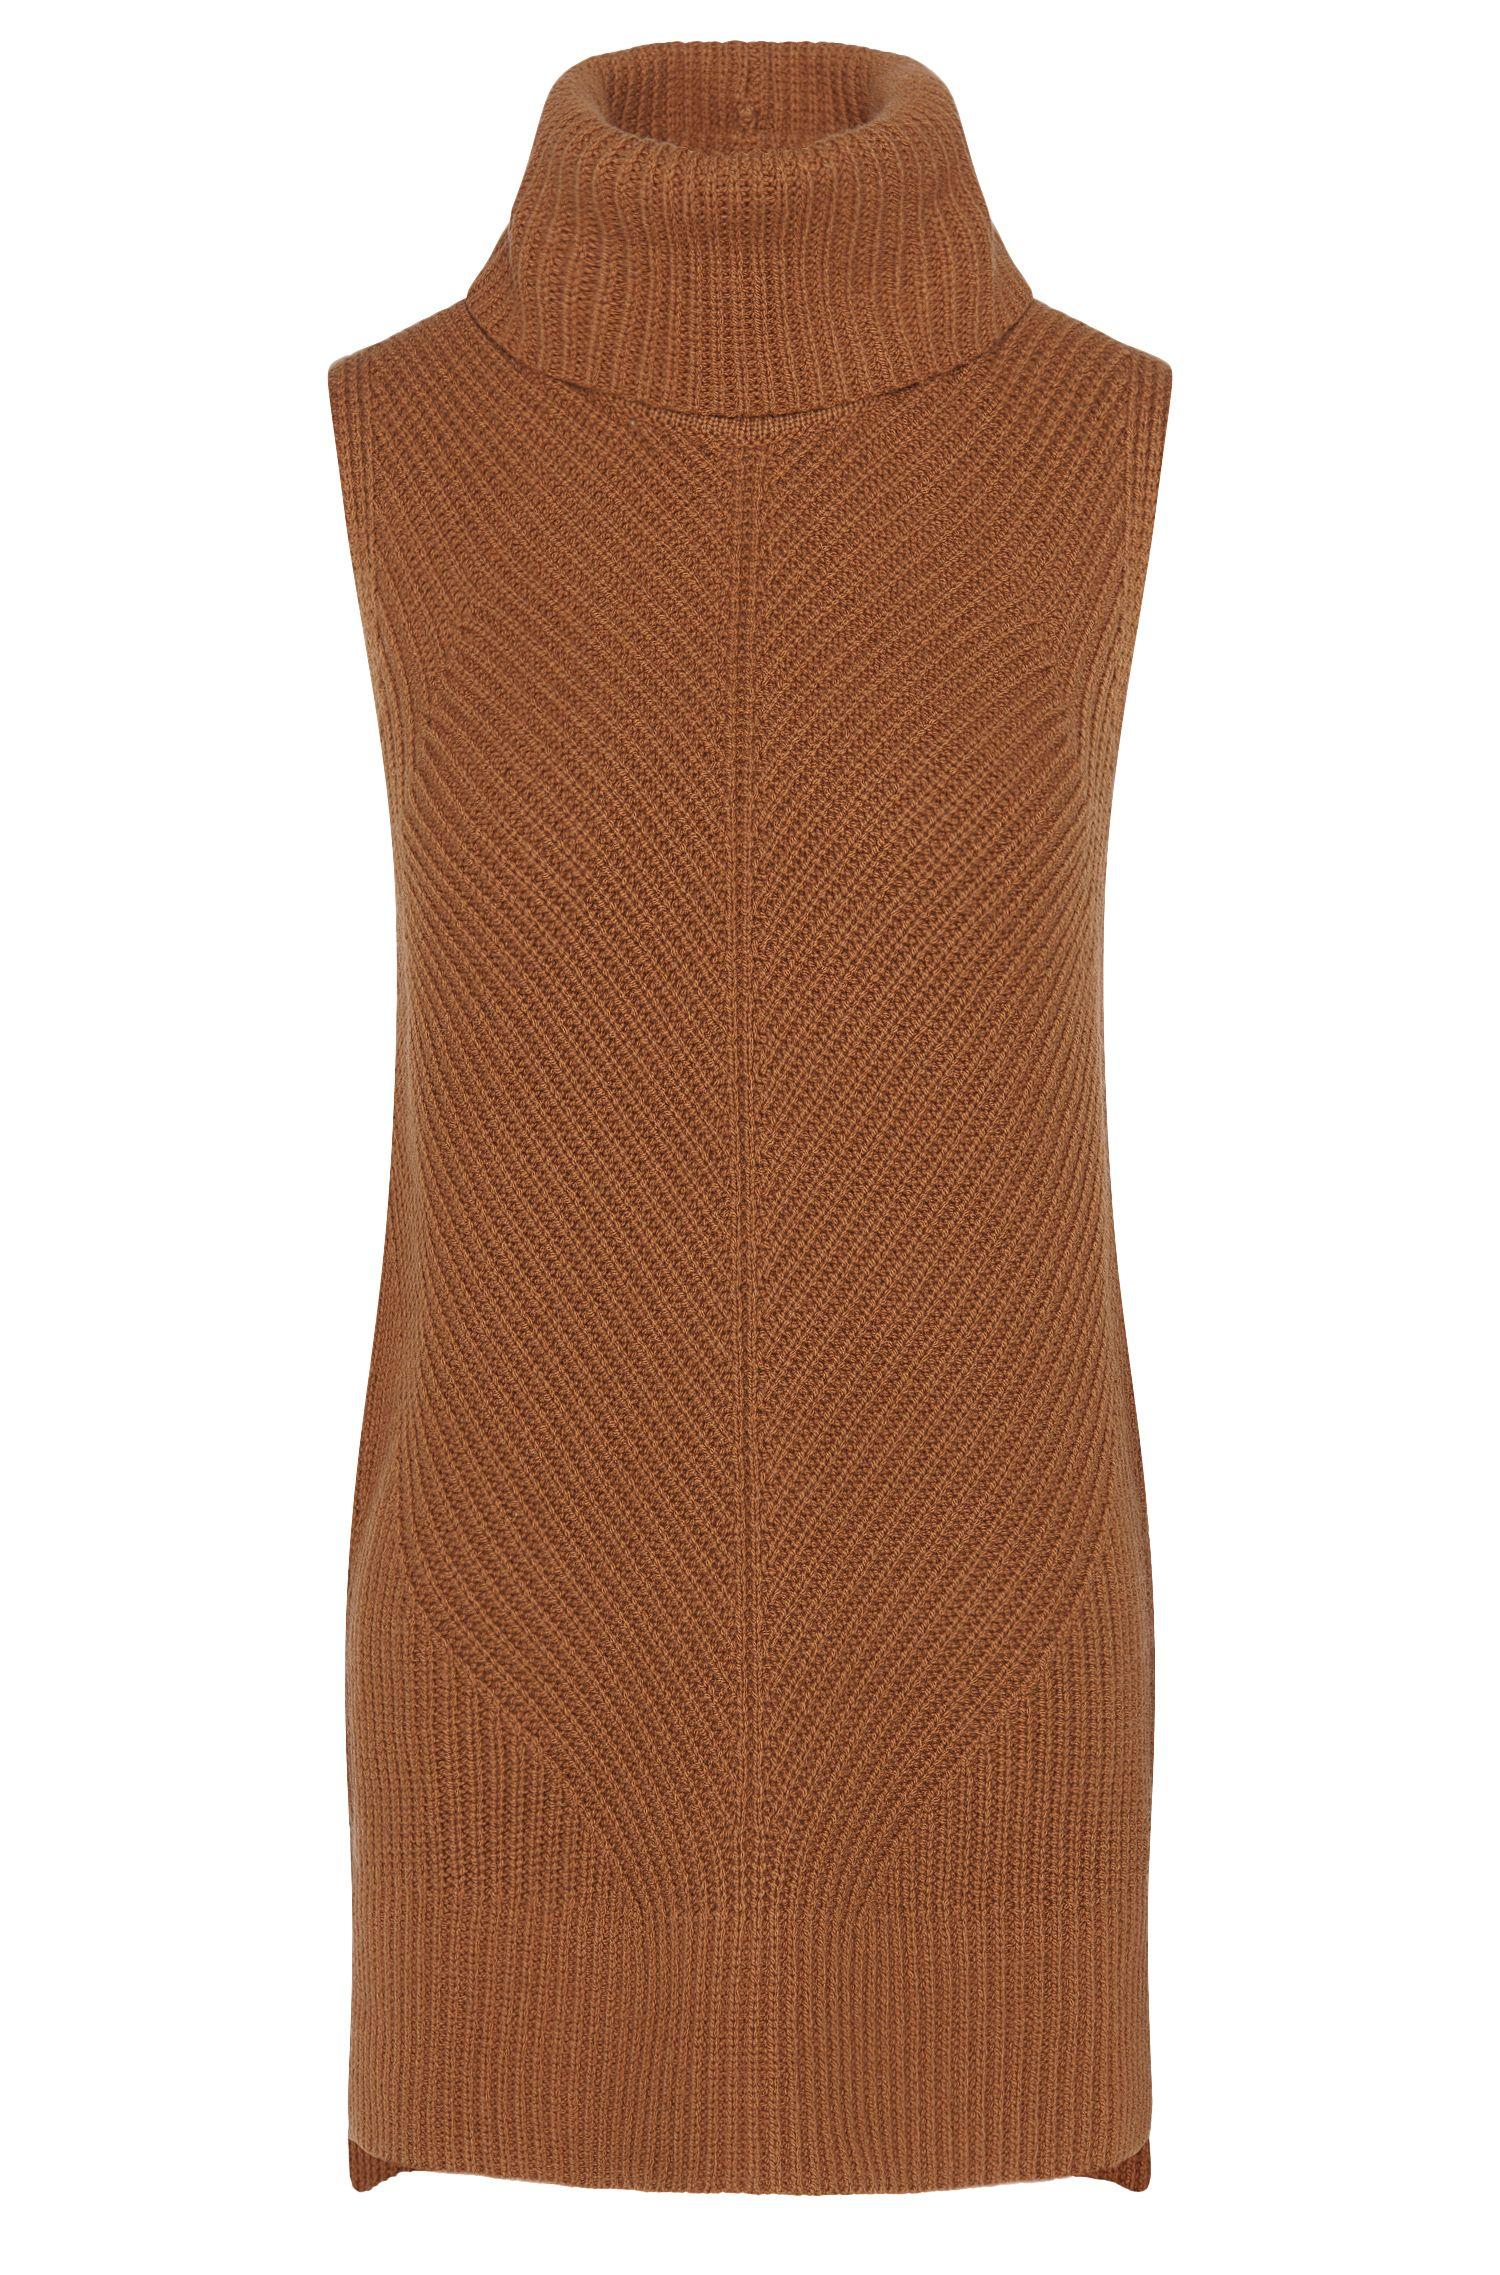 'Fala' | Virgin Wool Cashmere Yak Ribbed Sleeveless Turtleneck